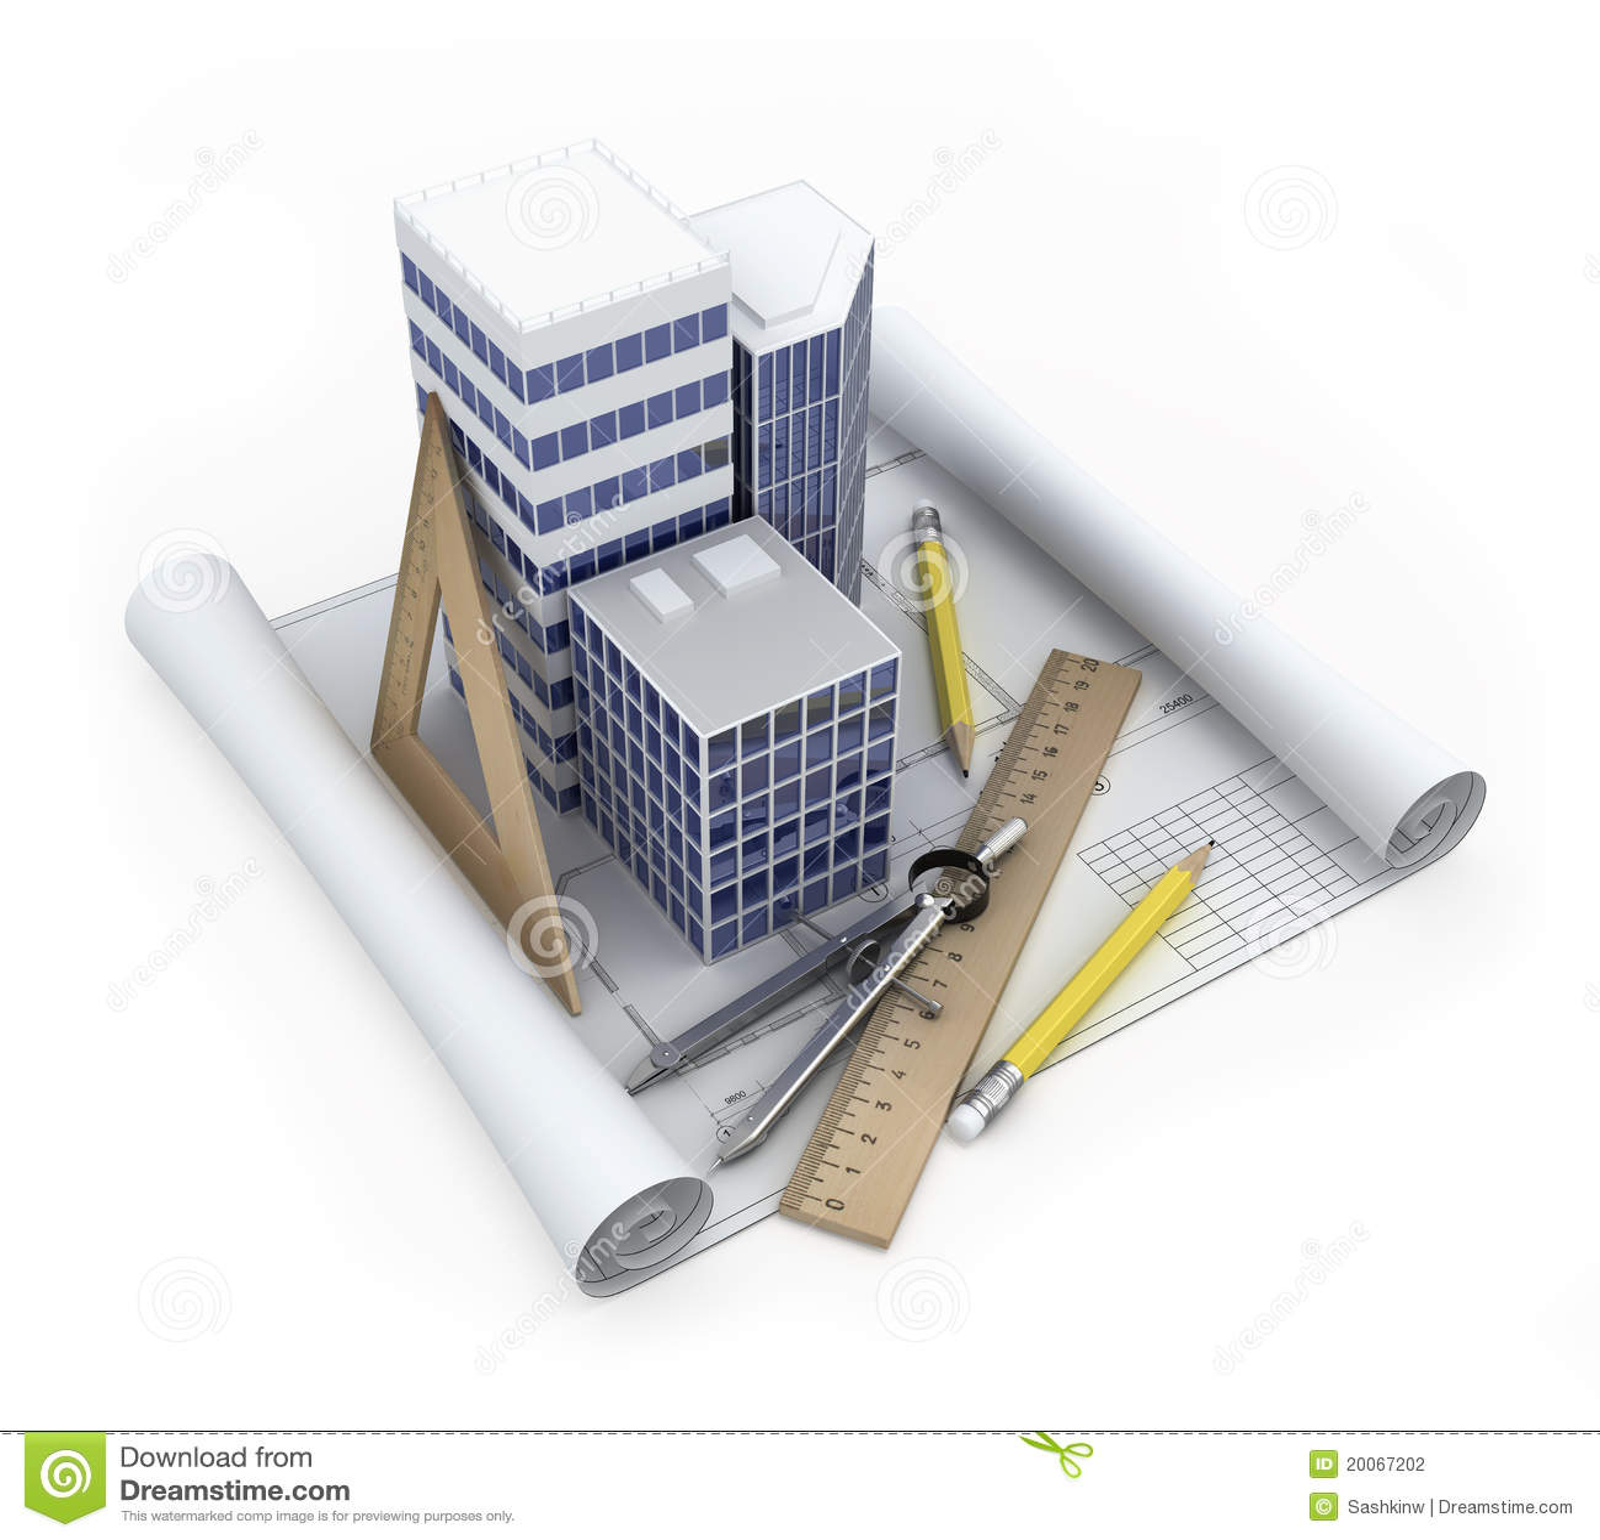 Stock Photography Building Development Concept Image20067202 on White House 3d Blueprint